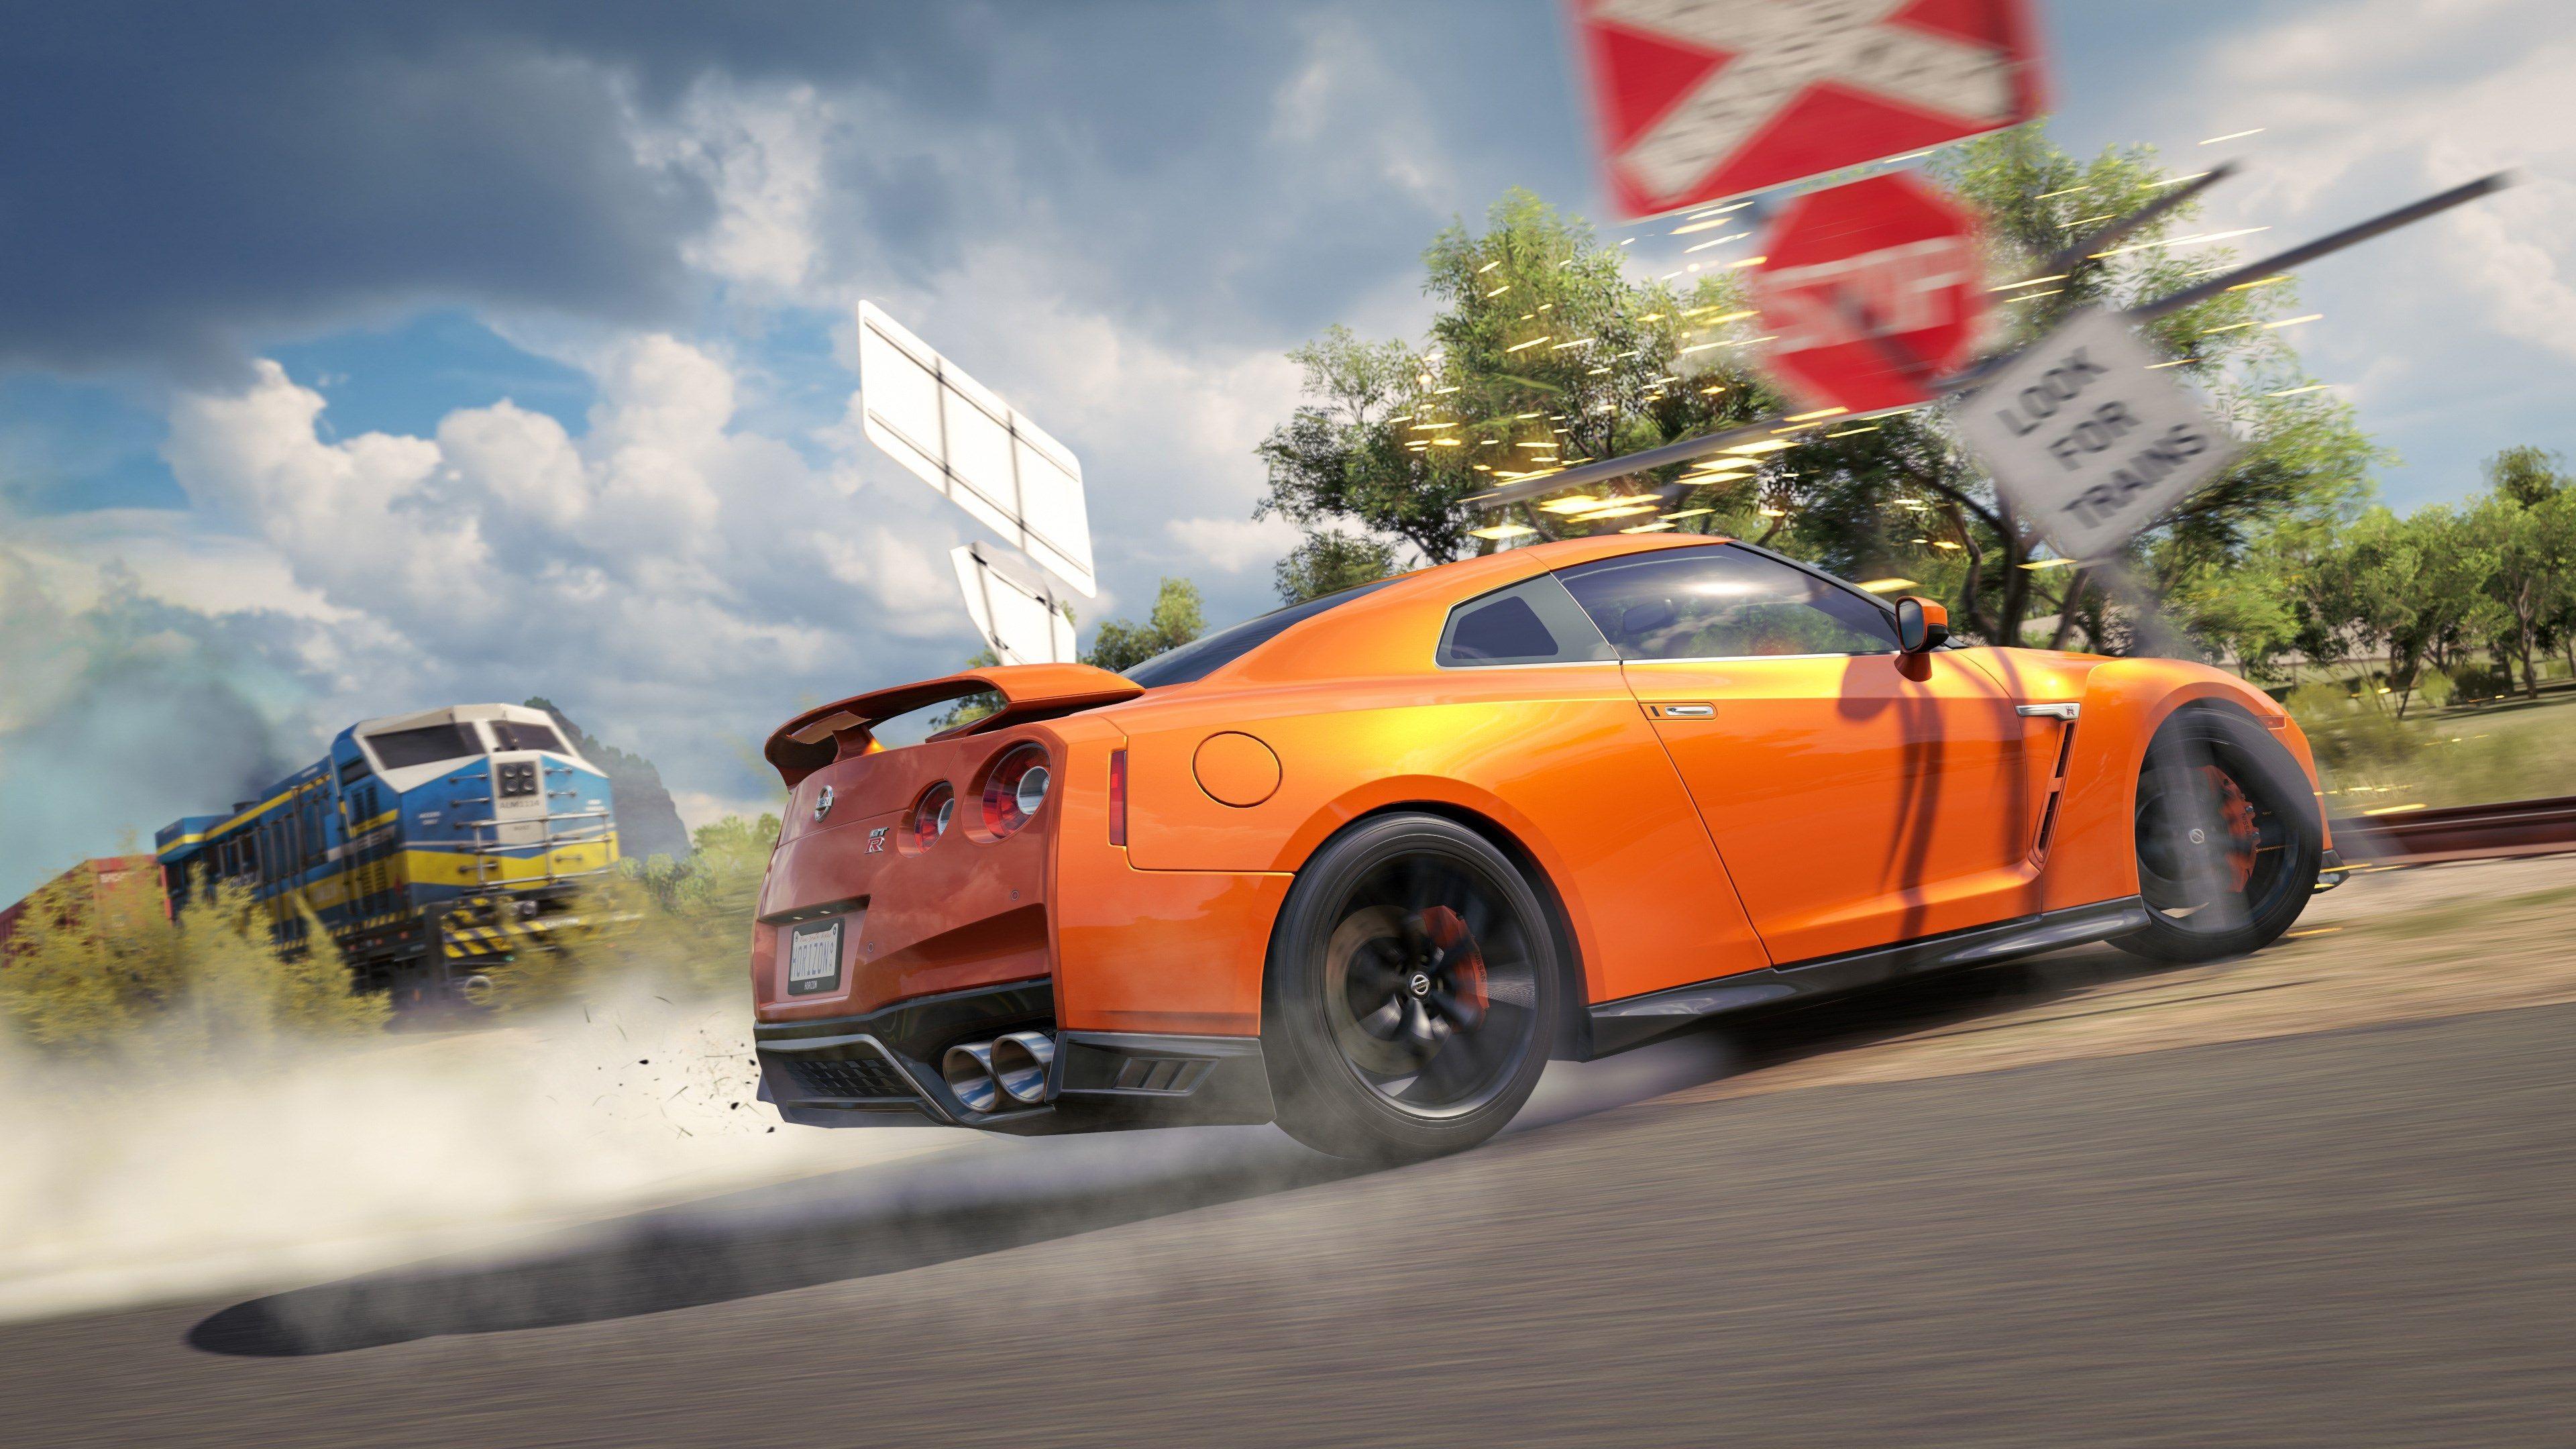 3840x2160 Forza Horizon 3 4k Best Pic Nissan Gtr Nissan Supercars